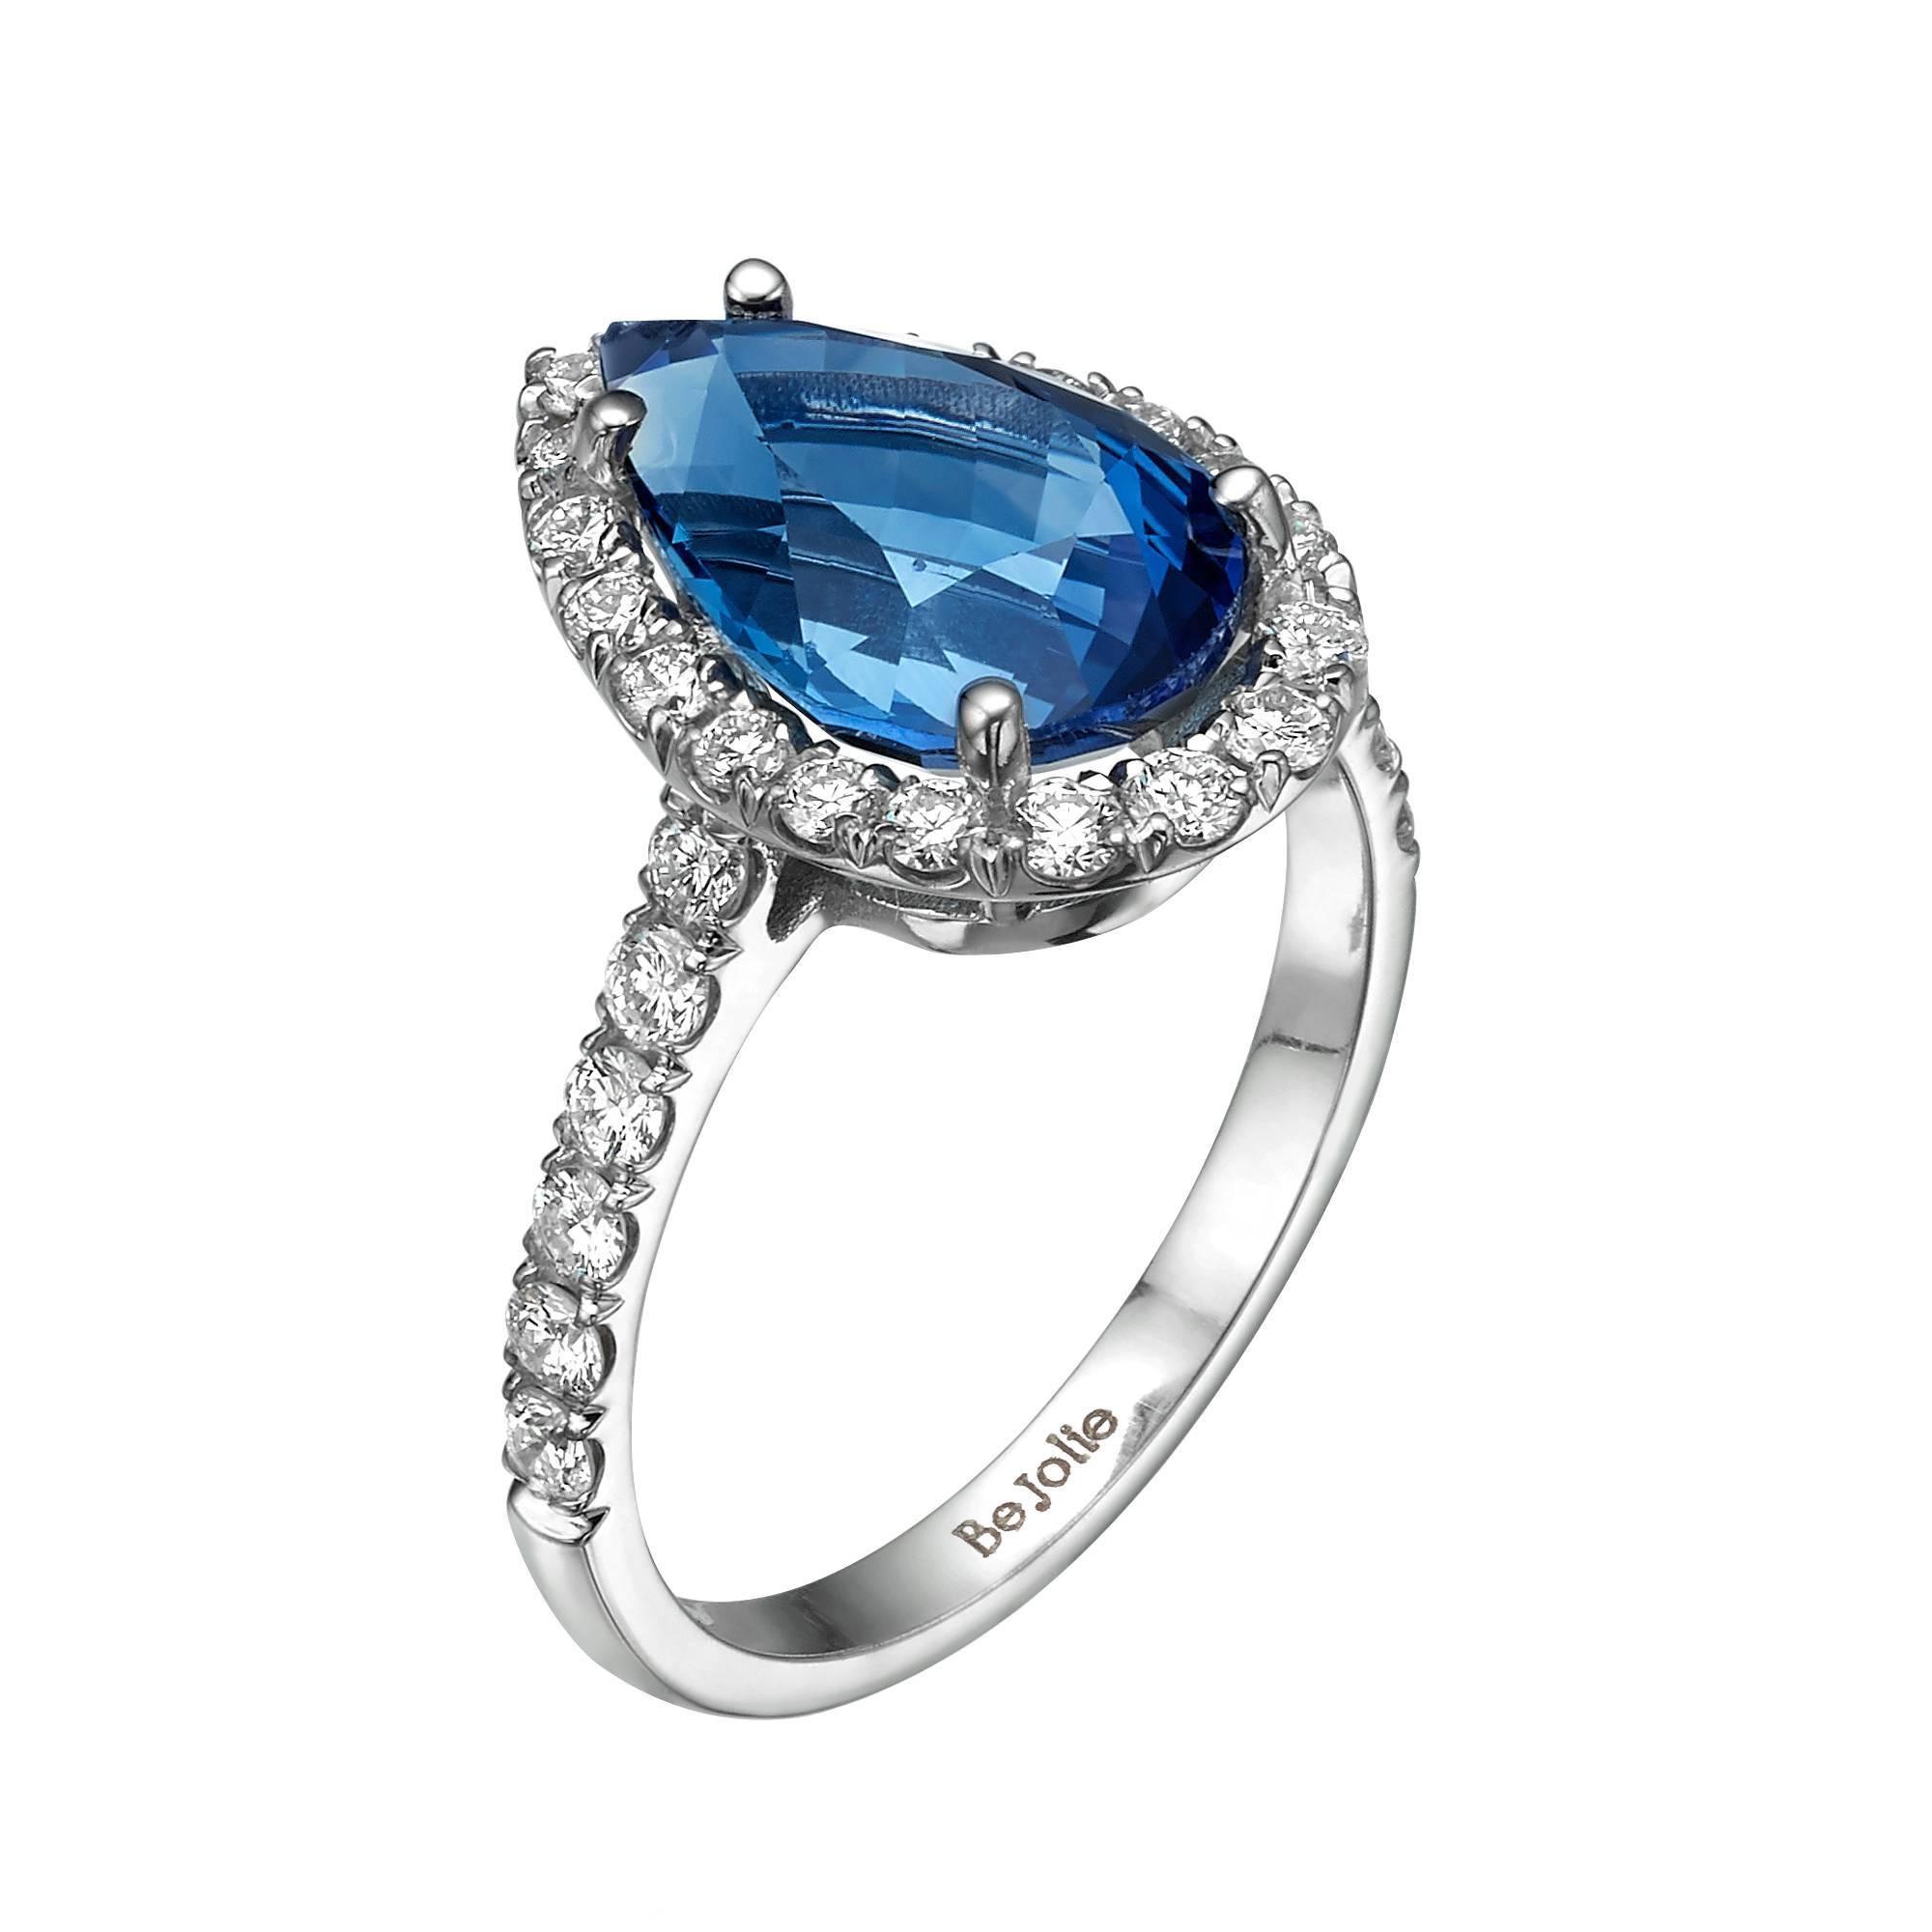 3.53 Carat Pear Shape Blue Sapphire & Diamond  Engagement Ring